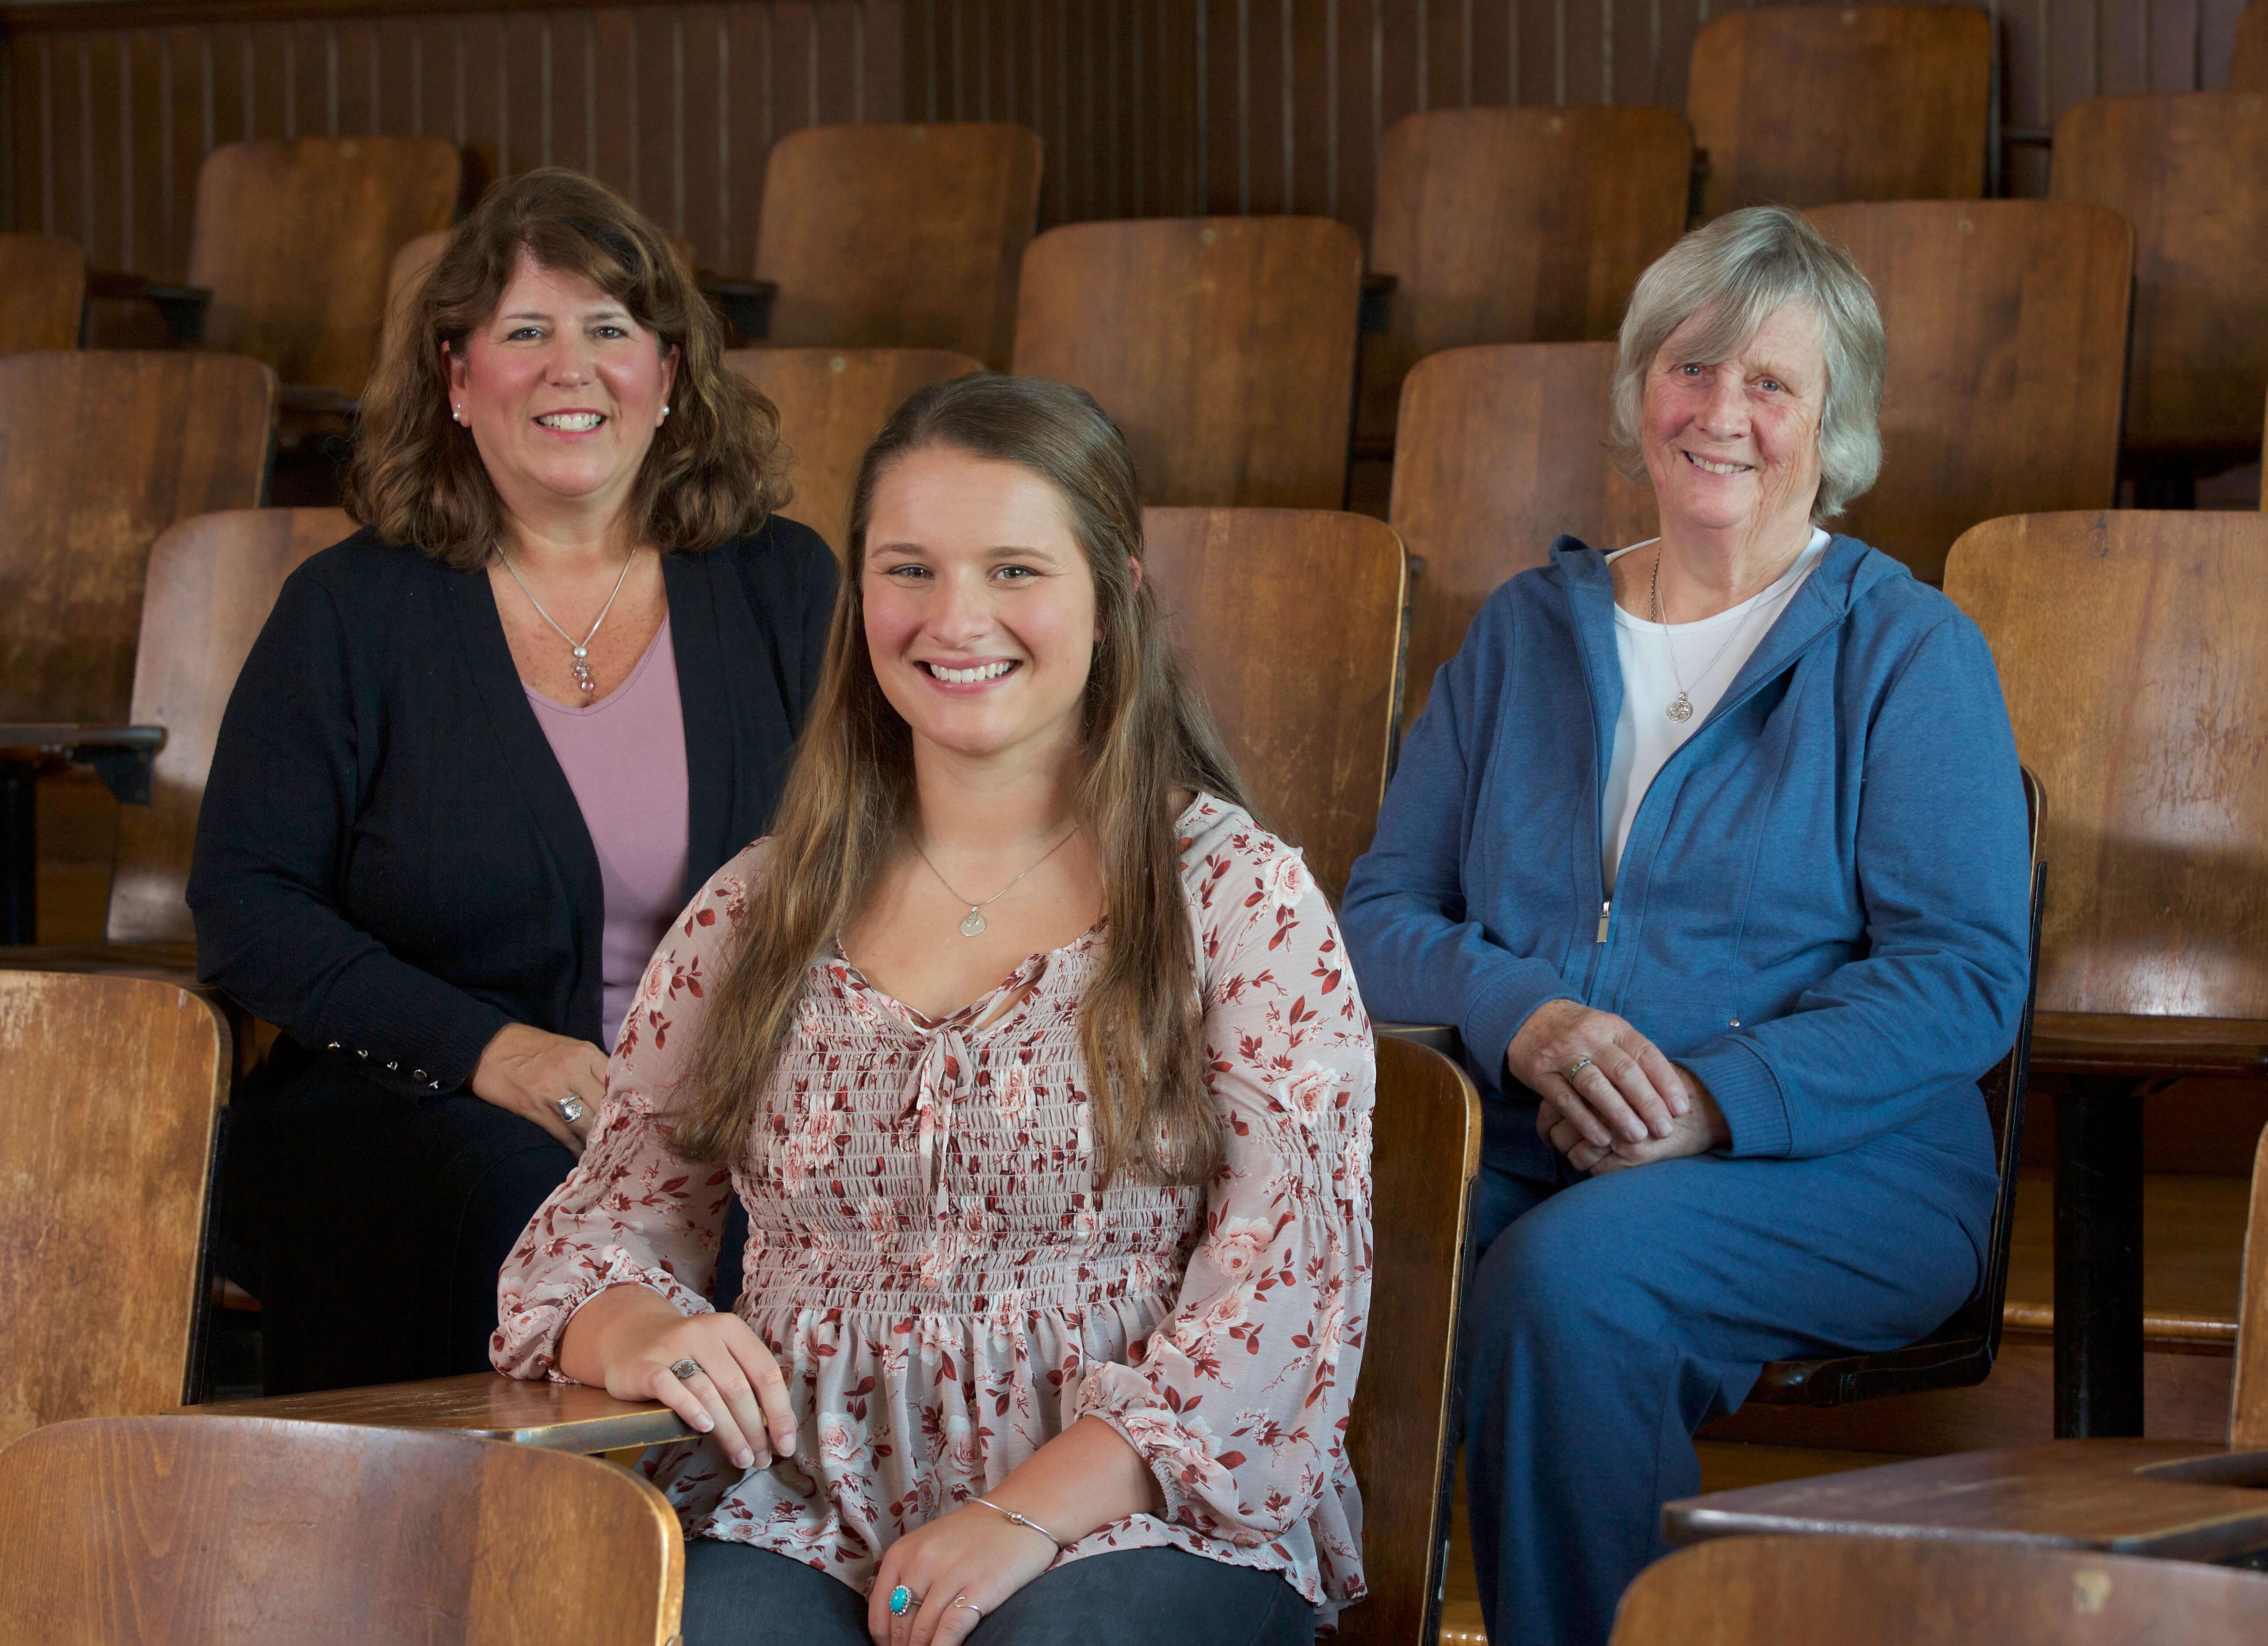 Photo of the Denault family; Tara Denault, M.Ed. '96 (left), Shannon Denault '19, and Joyce Denault '60.